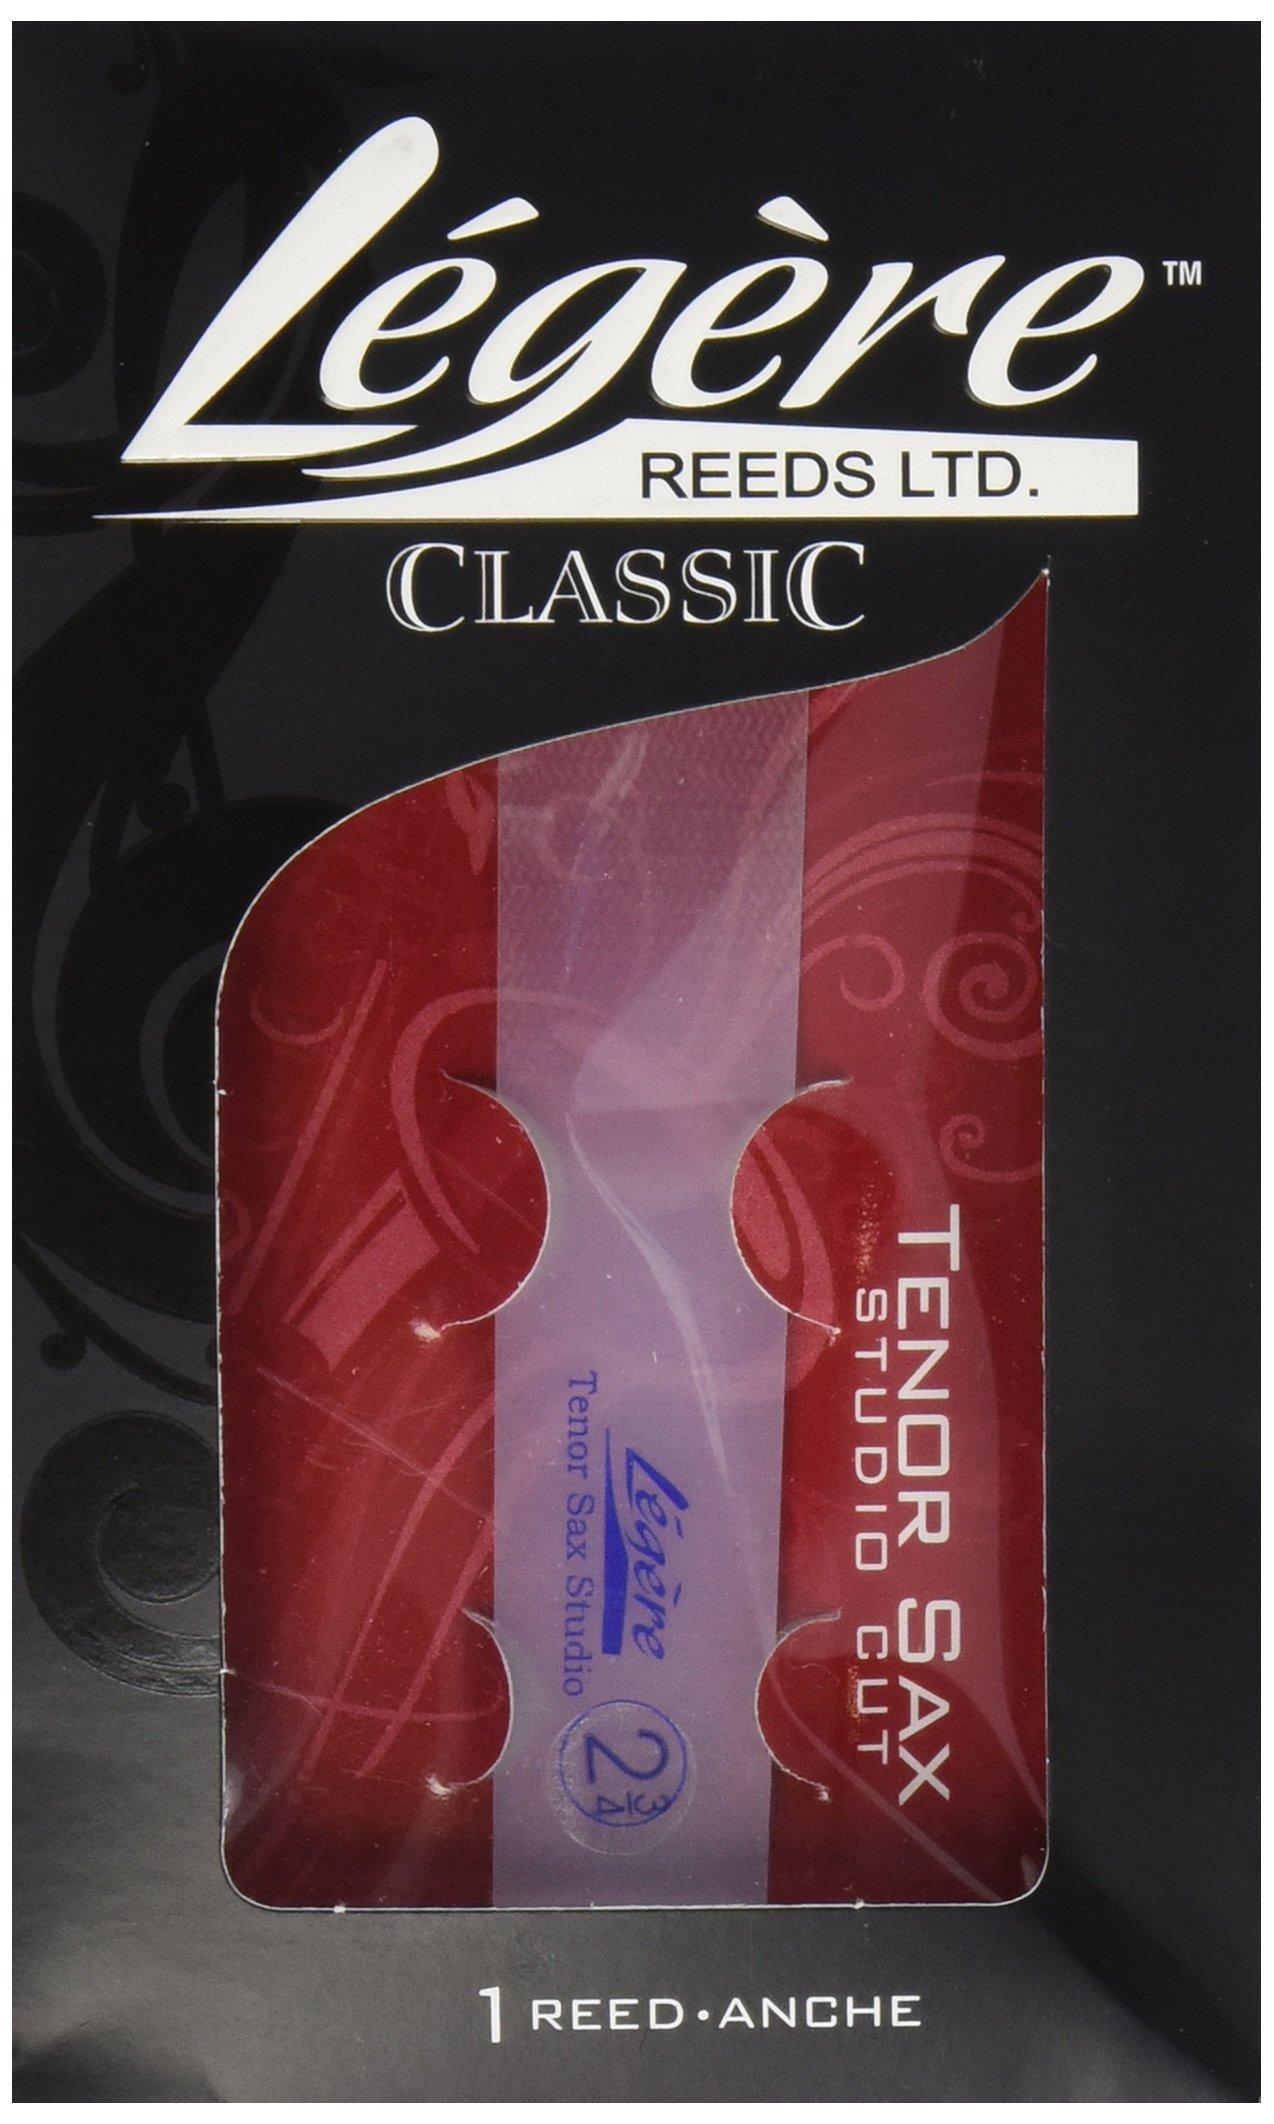 Legere TSS275 Bb Tenor Saxophone Studio Cut No. 2.75 Reed